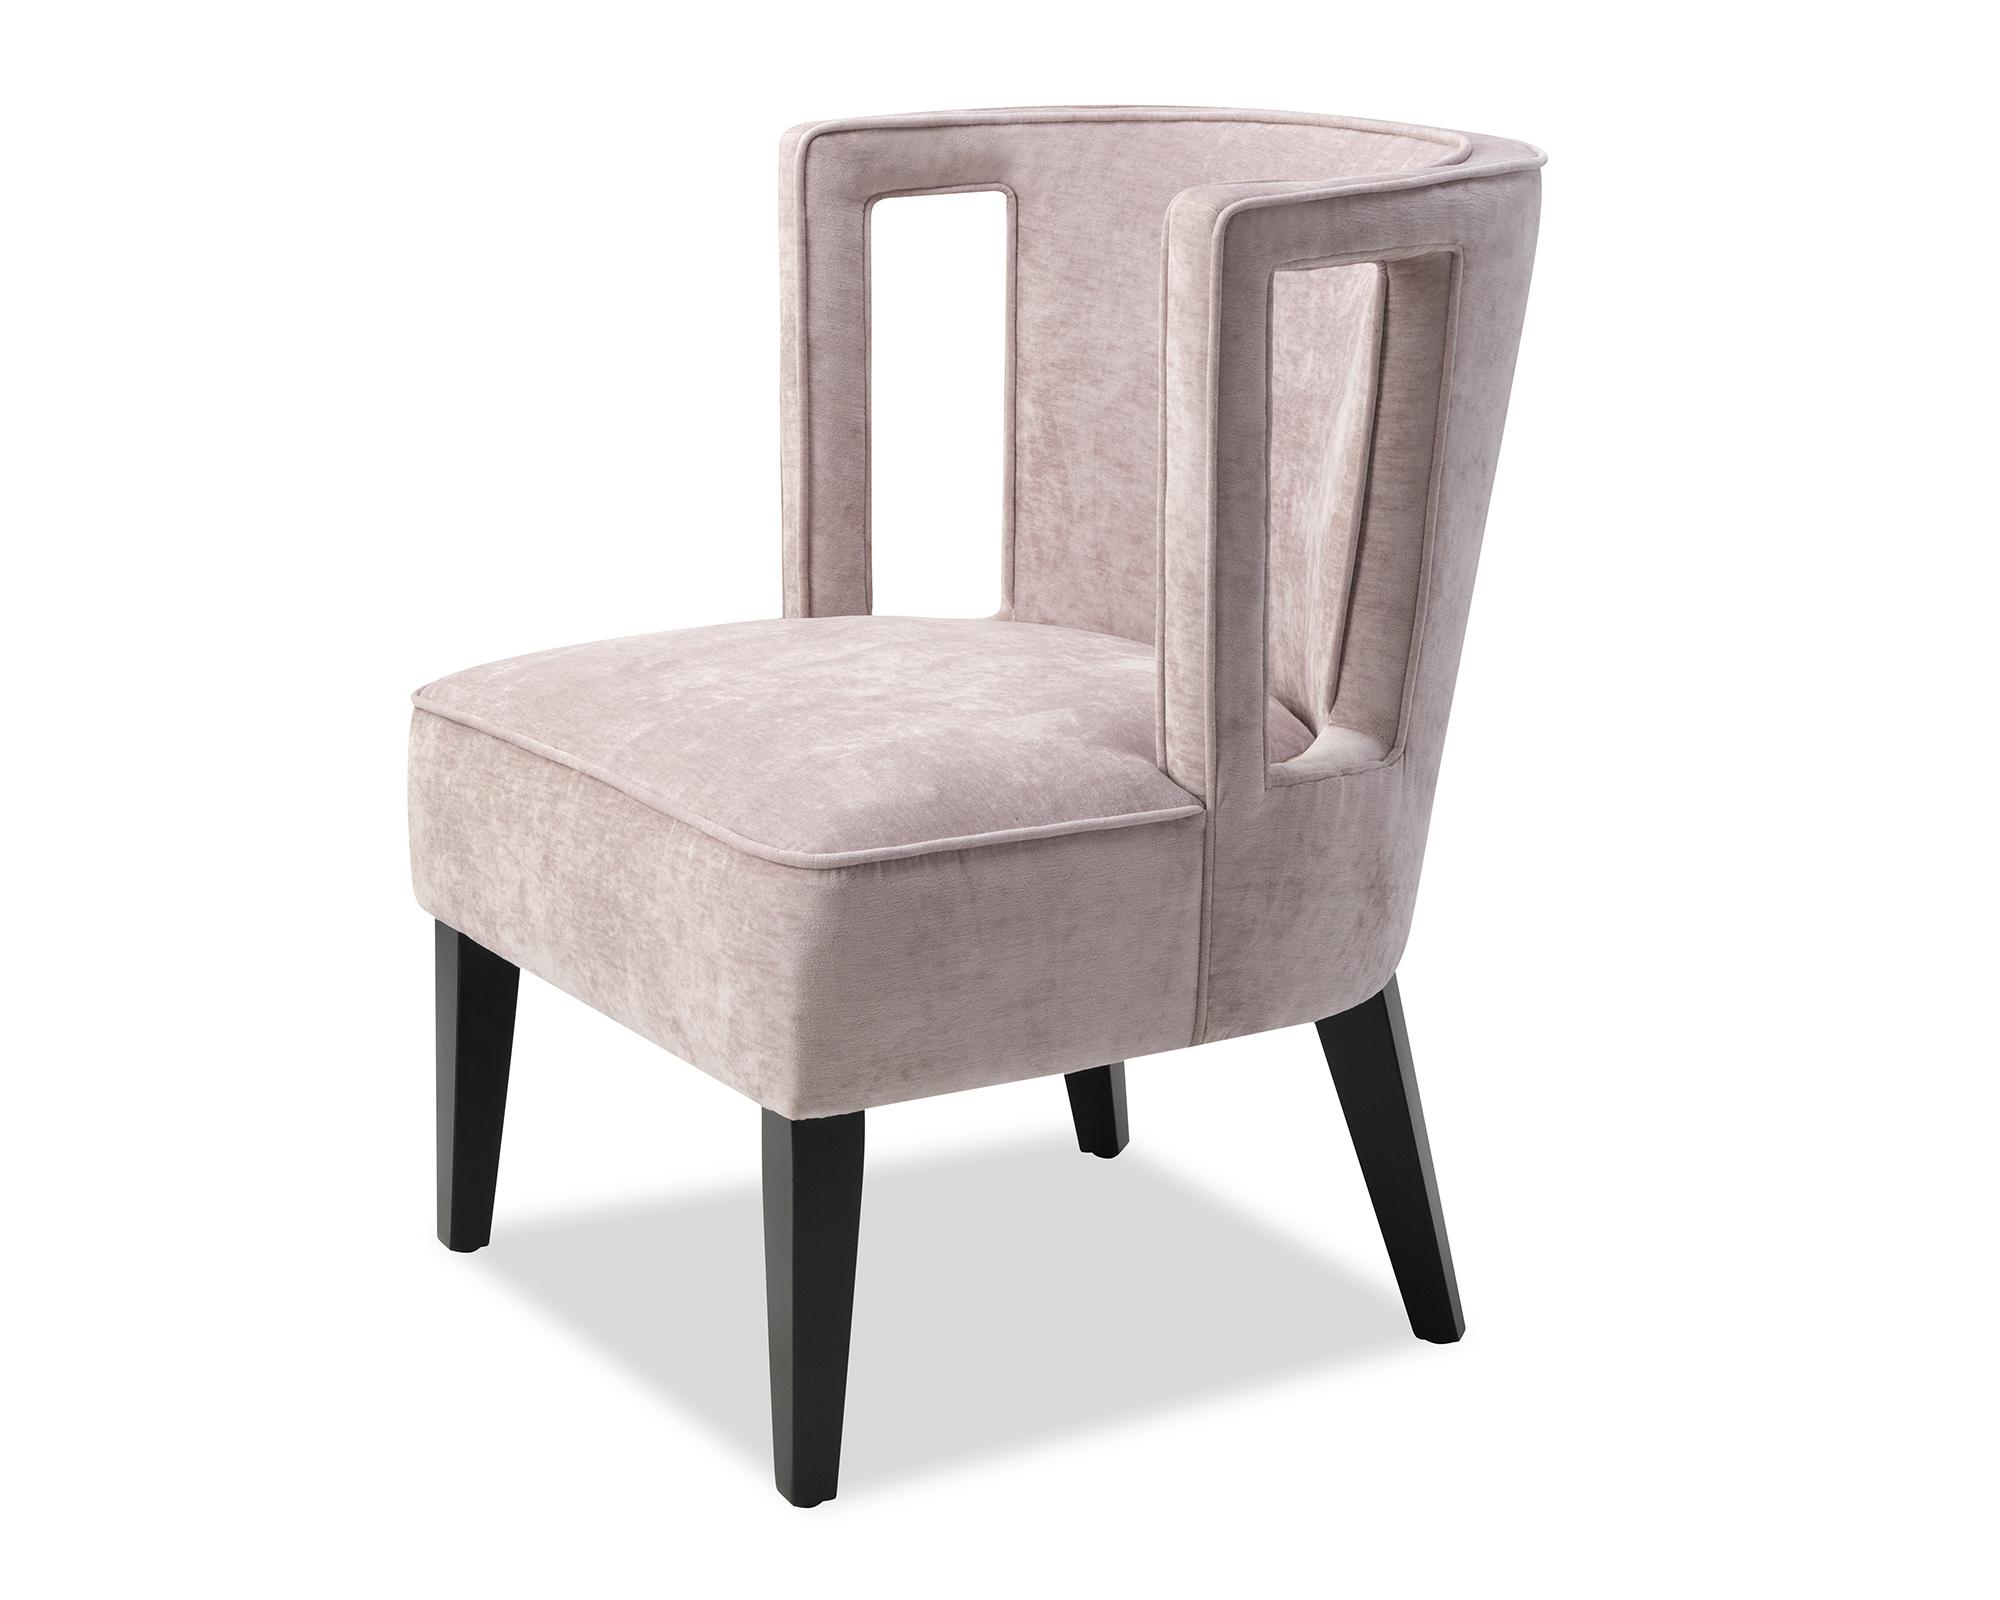 Liang & Eimil Cara Occasional Chair Lavender Velvet BH-OCH-083 (4)